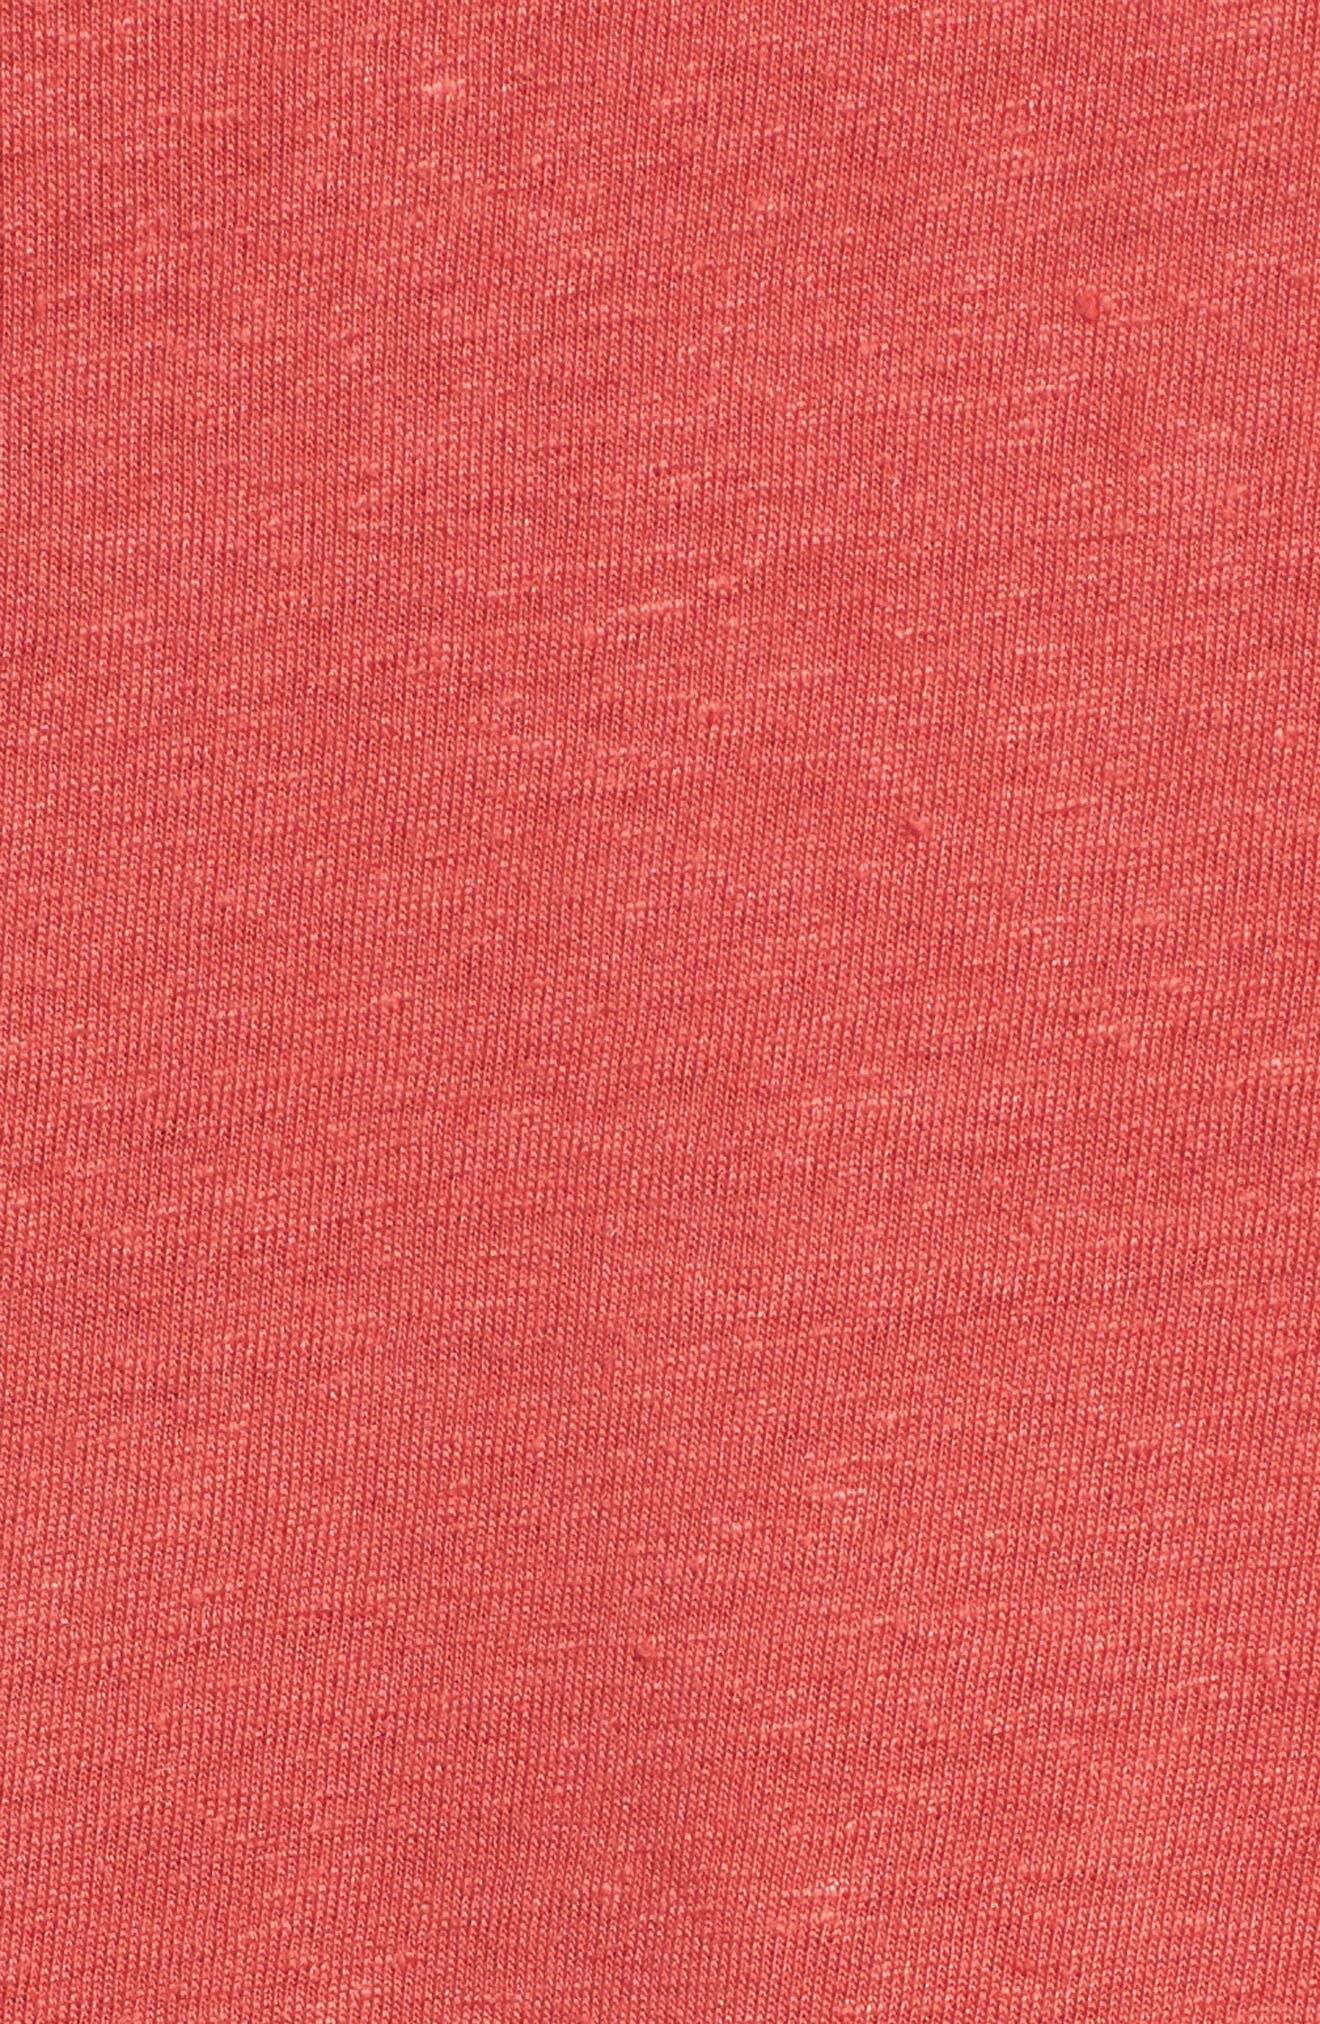 Ruffle Sleeve Tee,                             Alternate thumbnail 4, color,                             Chilli Pepper